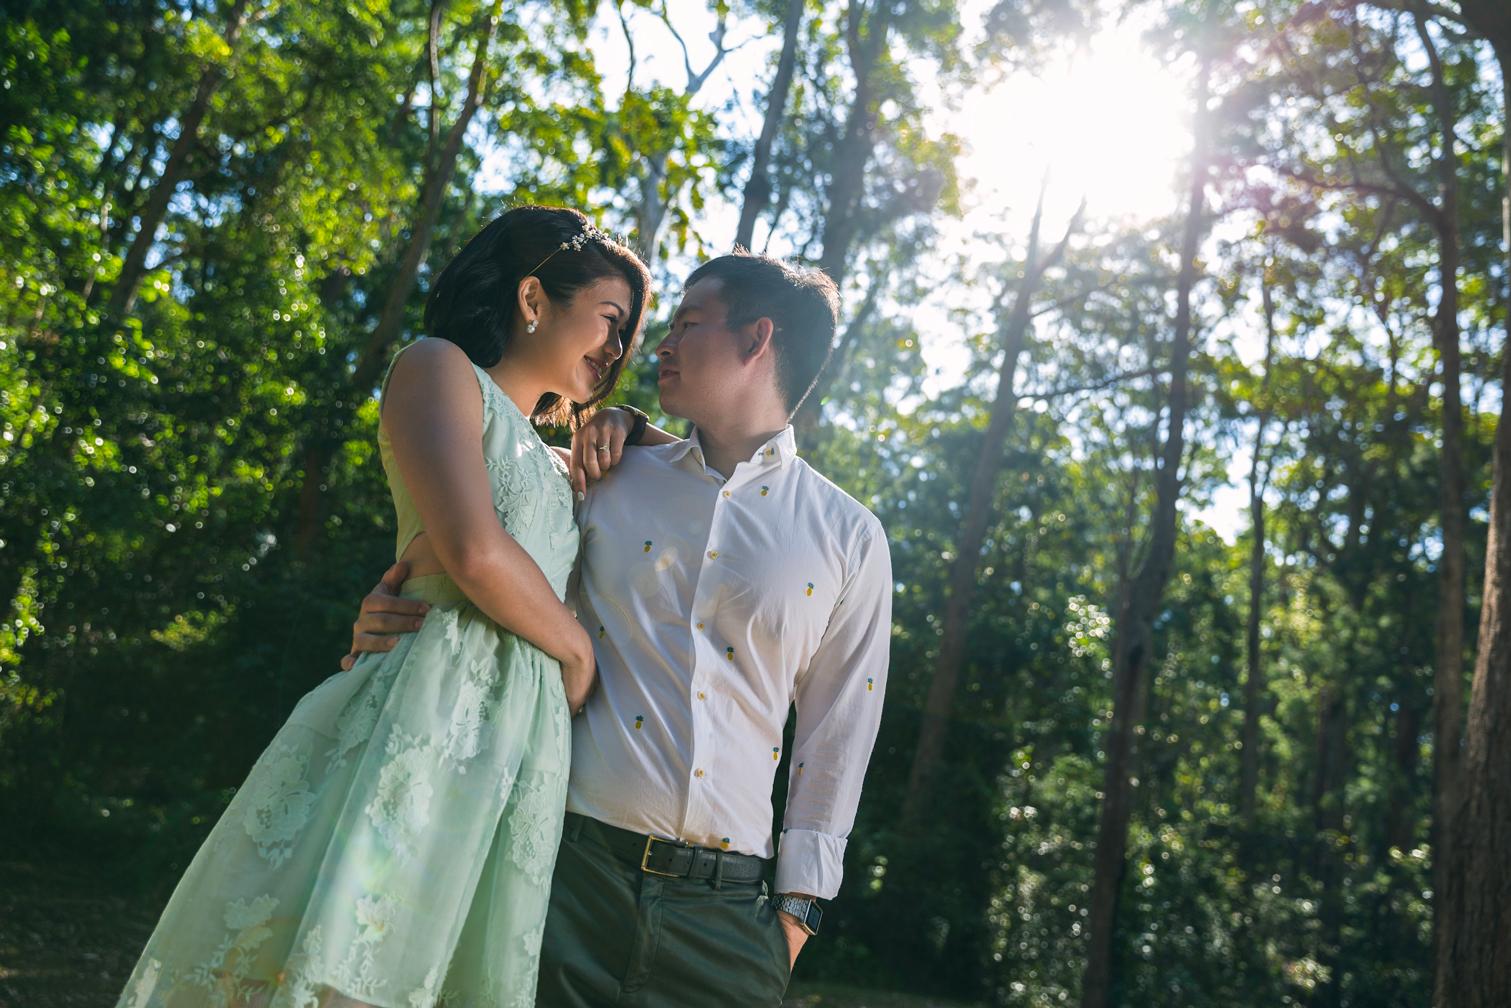 Mount Tamborine, Brisbane, Australia  Overseas Wedding Portraiture